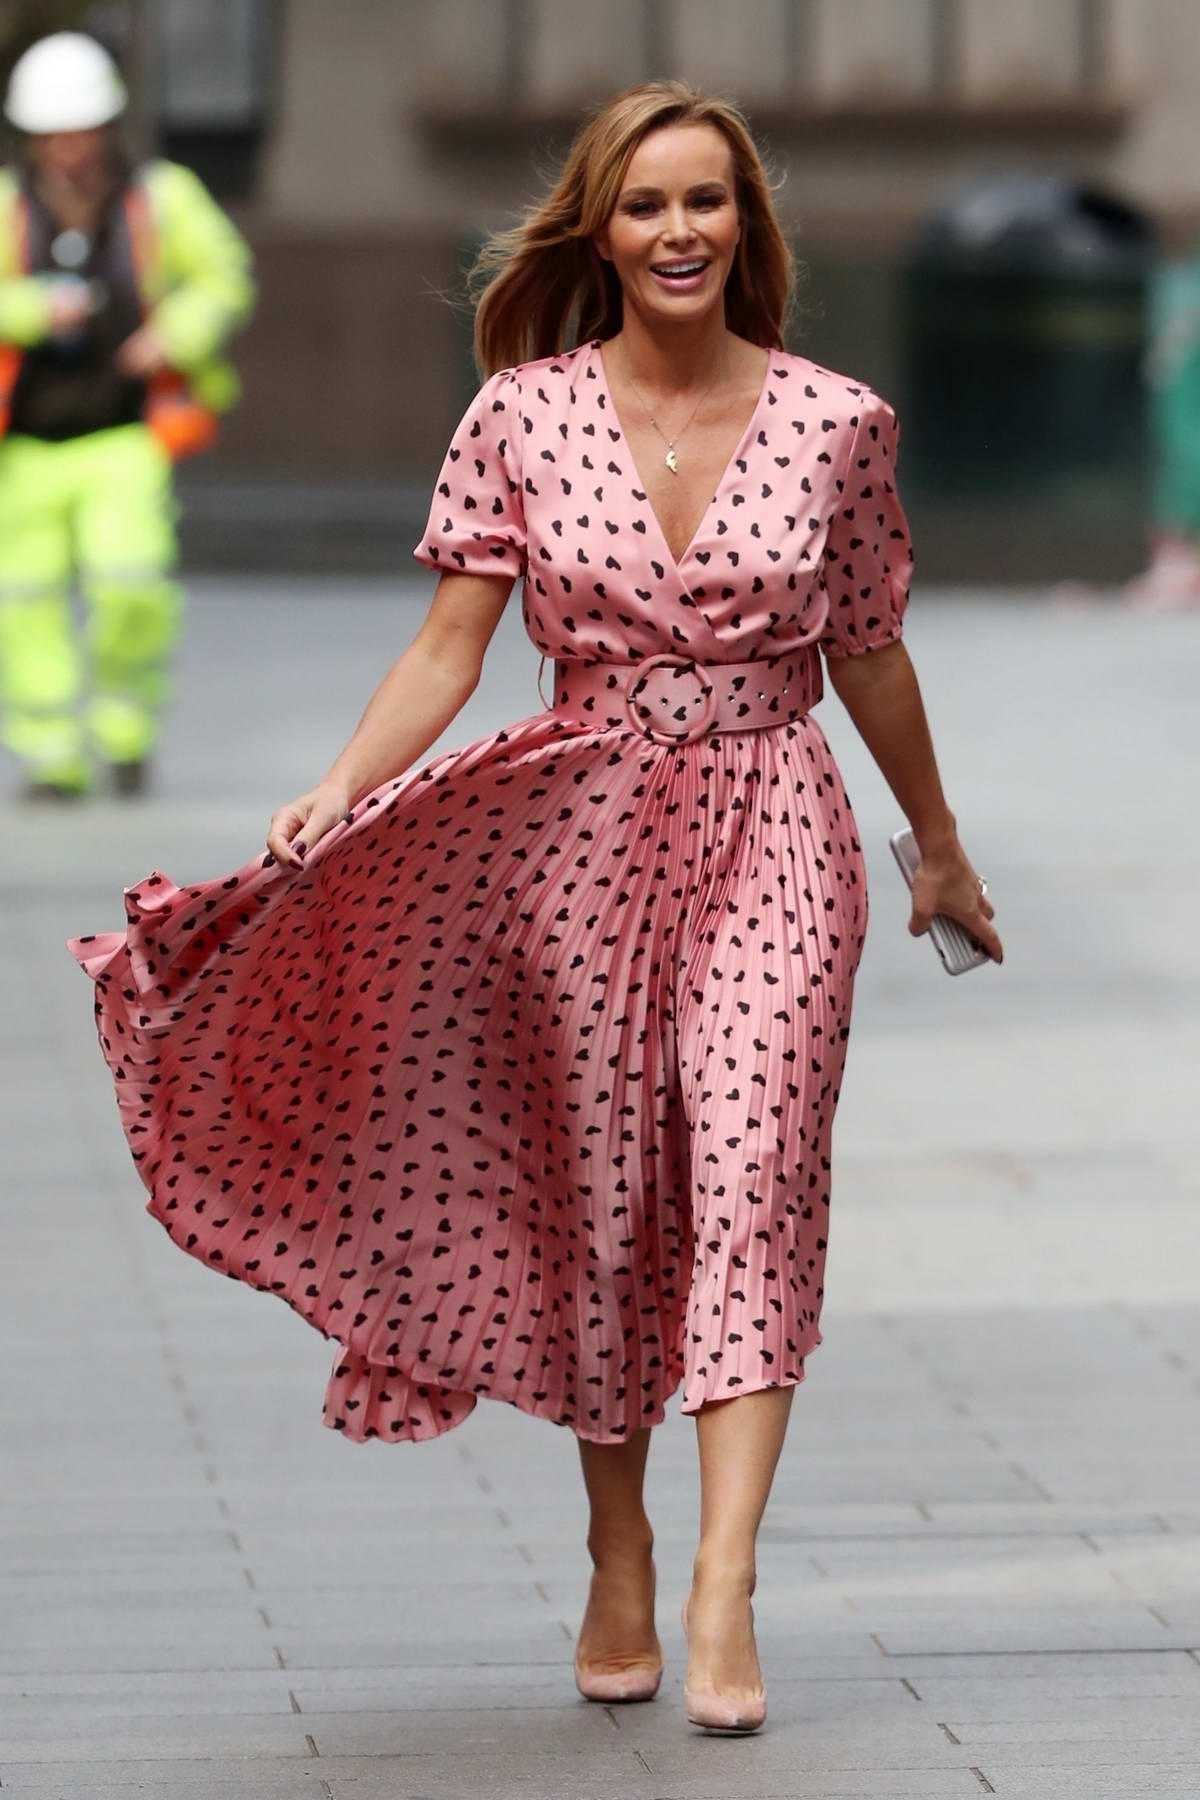 Amanda Holden seen wearing a pink heart print dress as she leaves Global Radio studios in London, UK